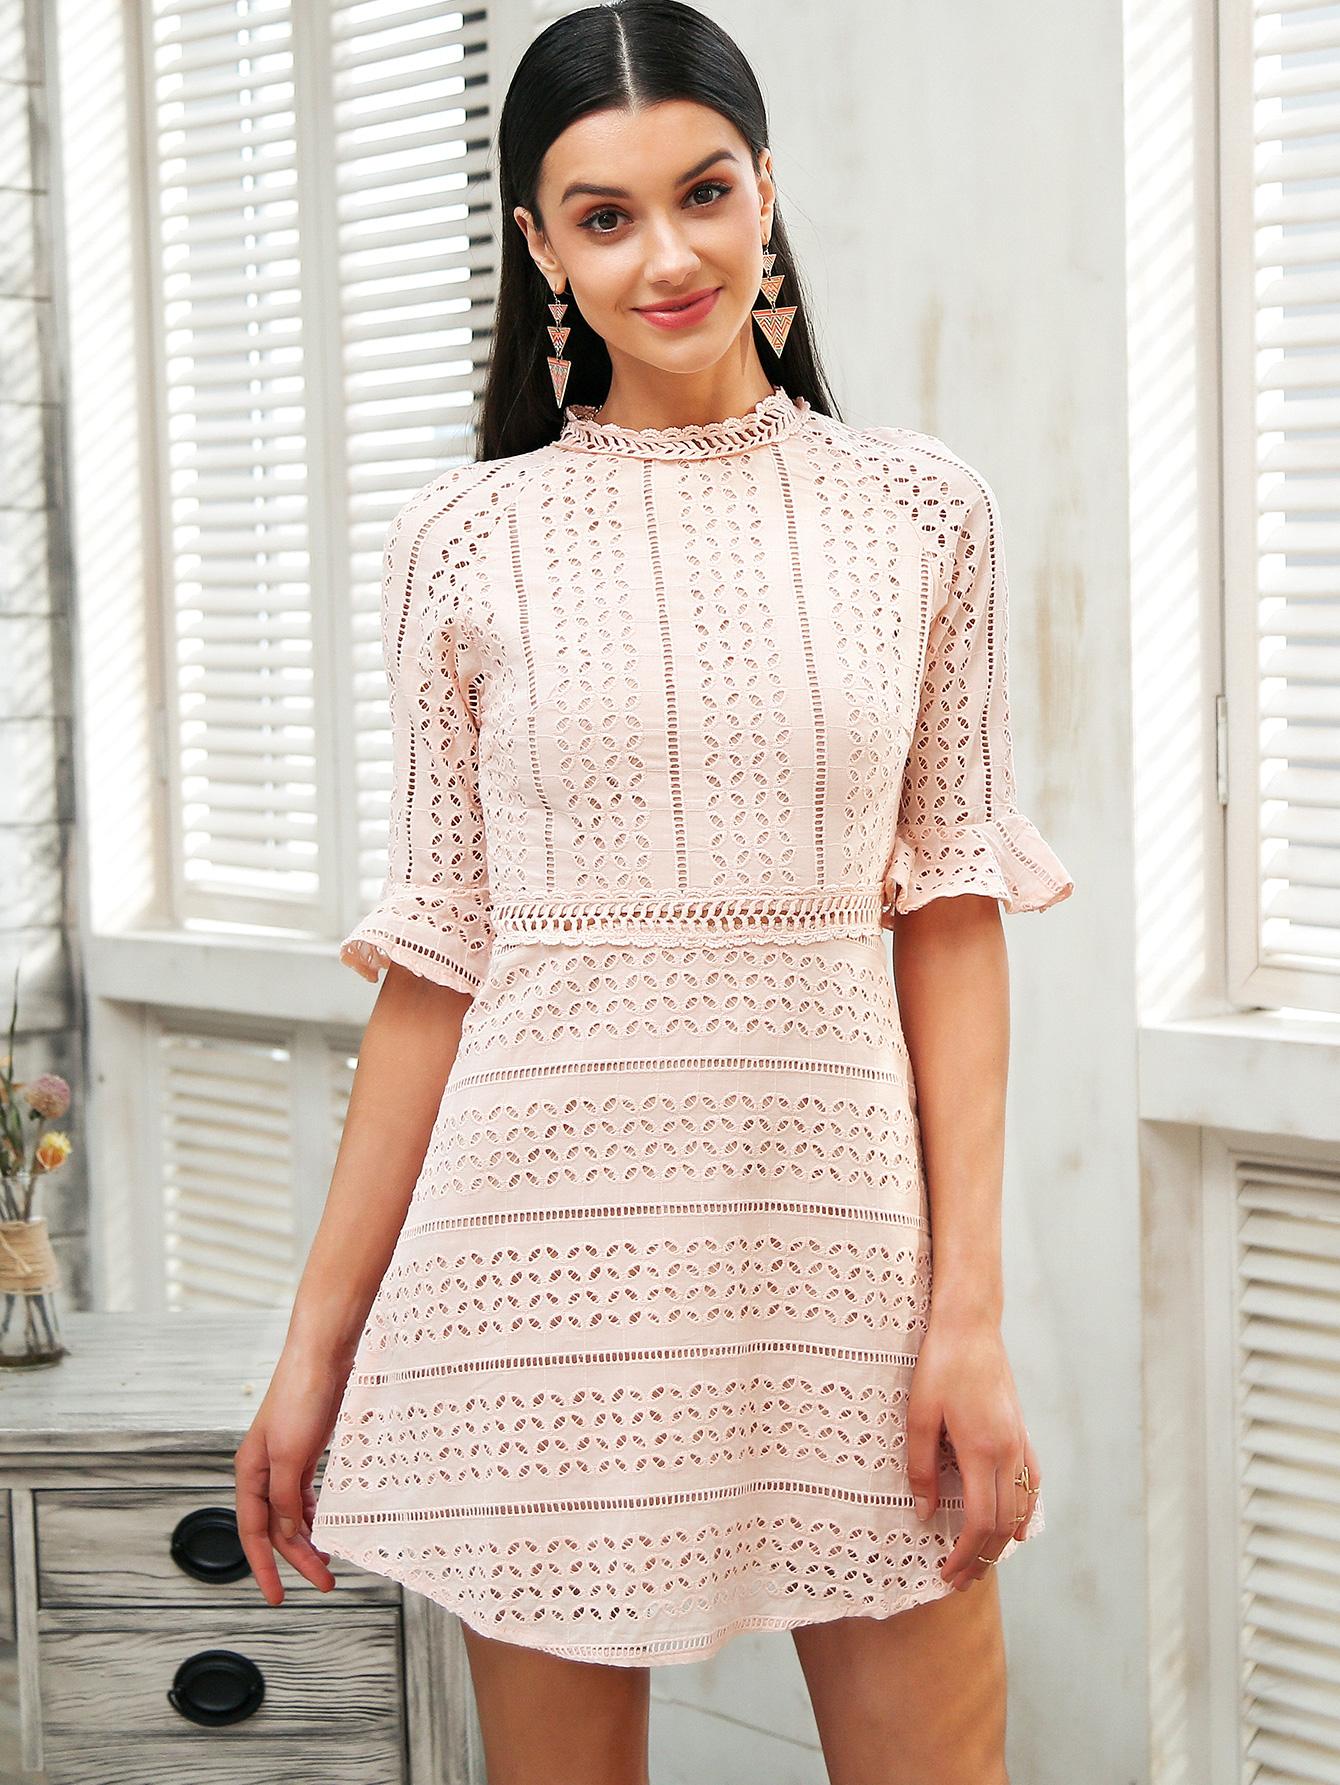 Dulce dama de media manga vestido rosa ropa de mujer al por mayor NHDE189500